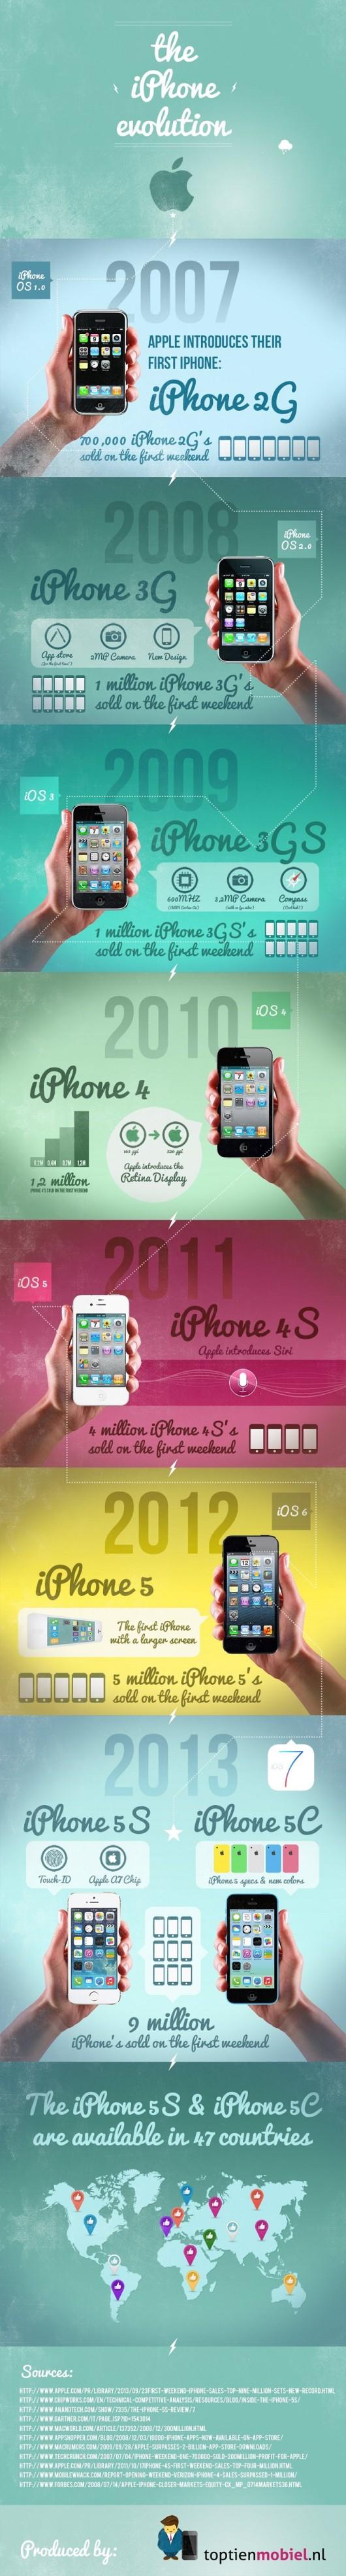 iPhone-Evolution-Infographic-530x3943